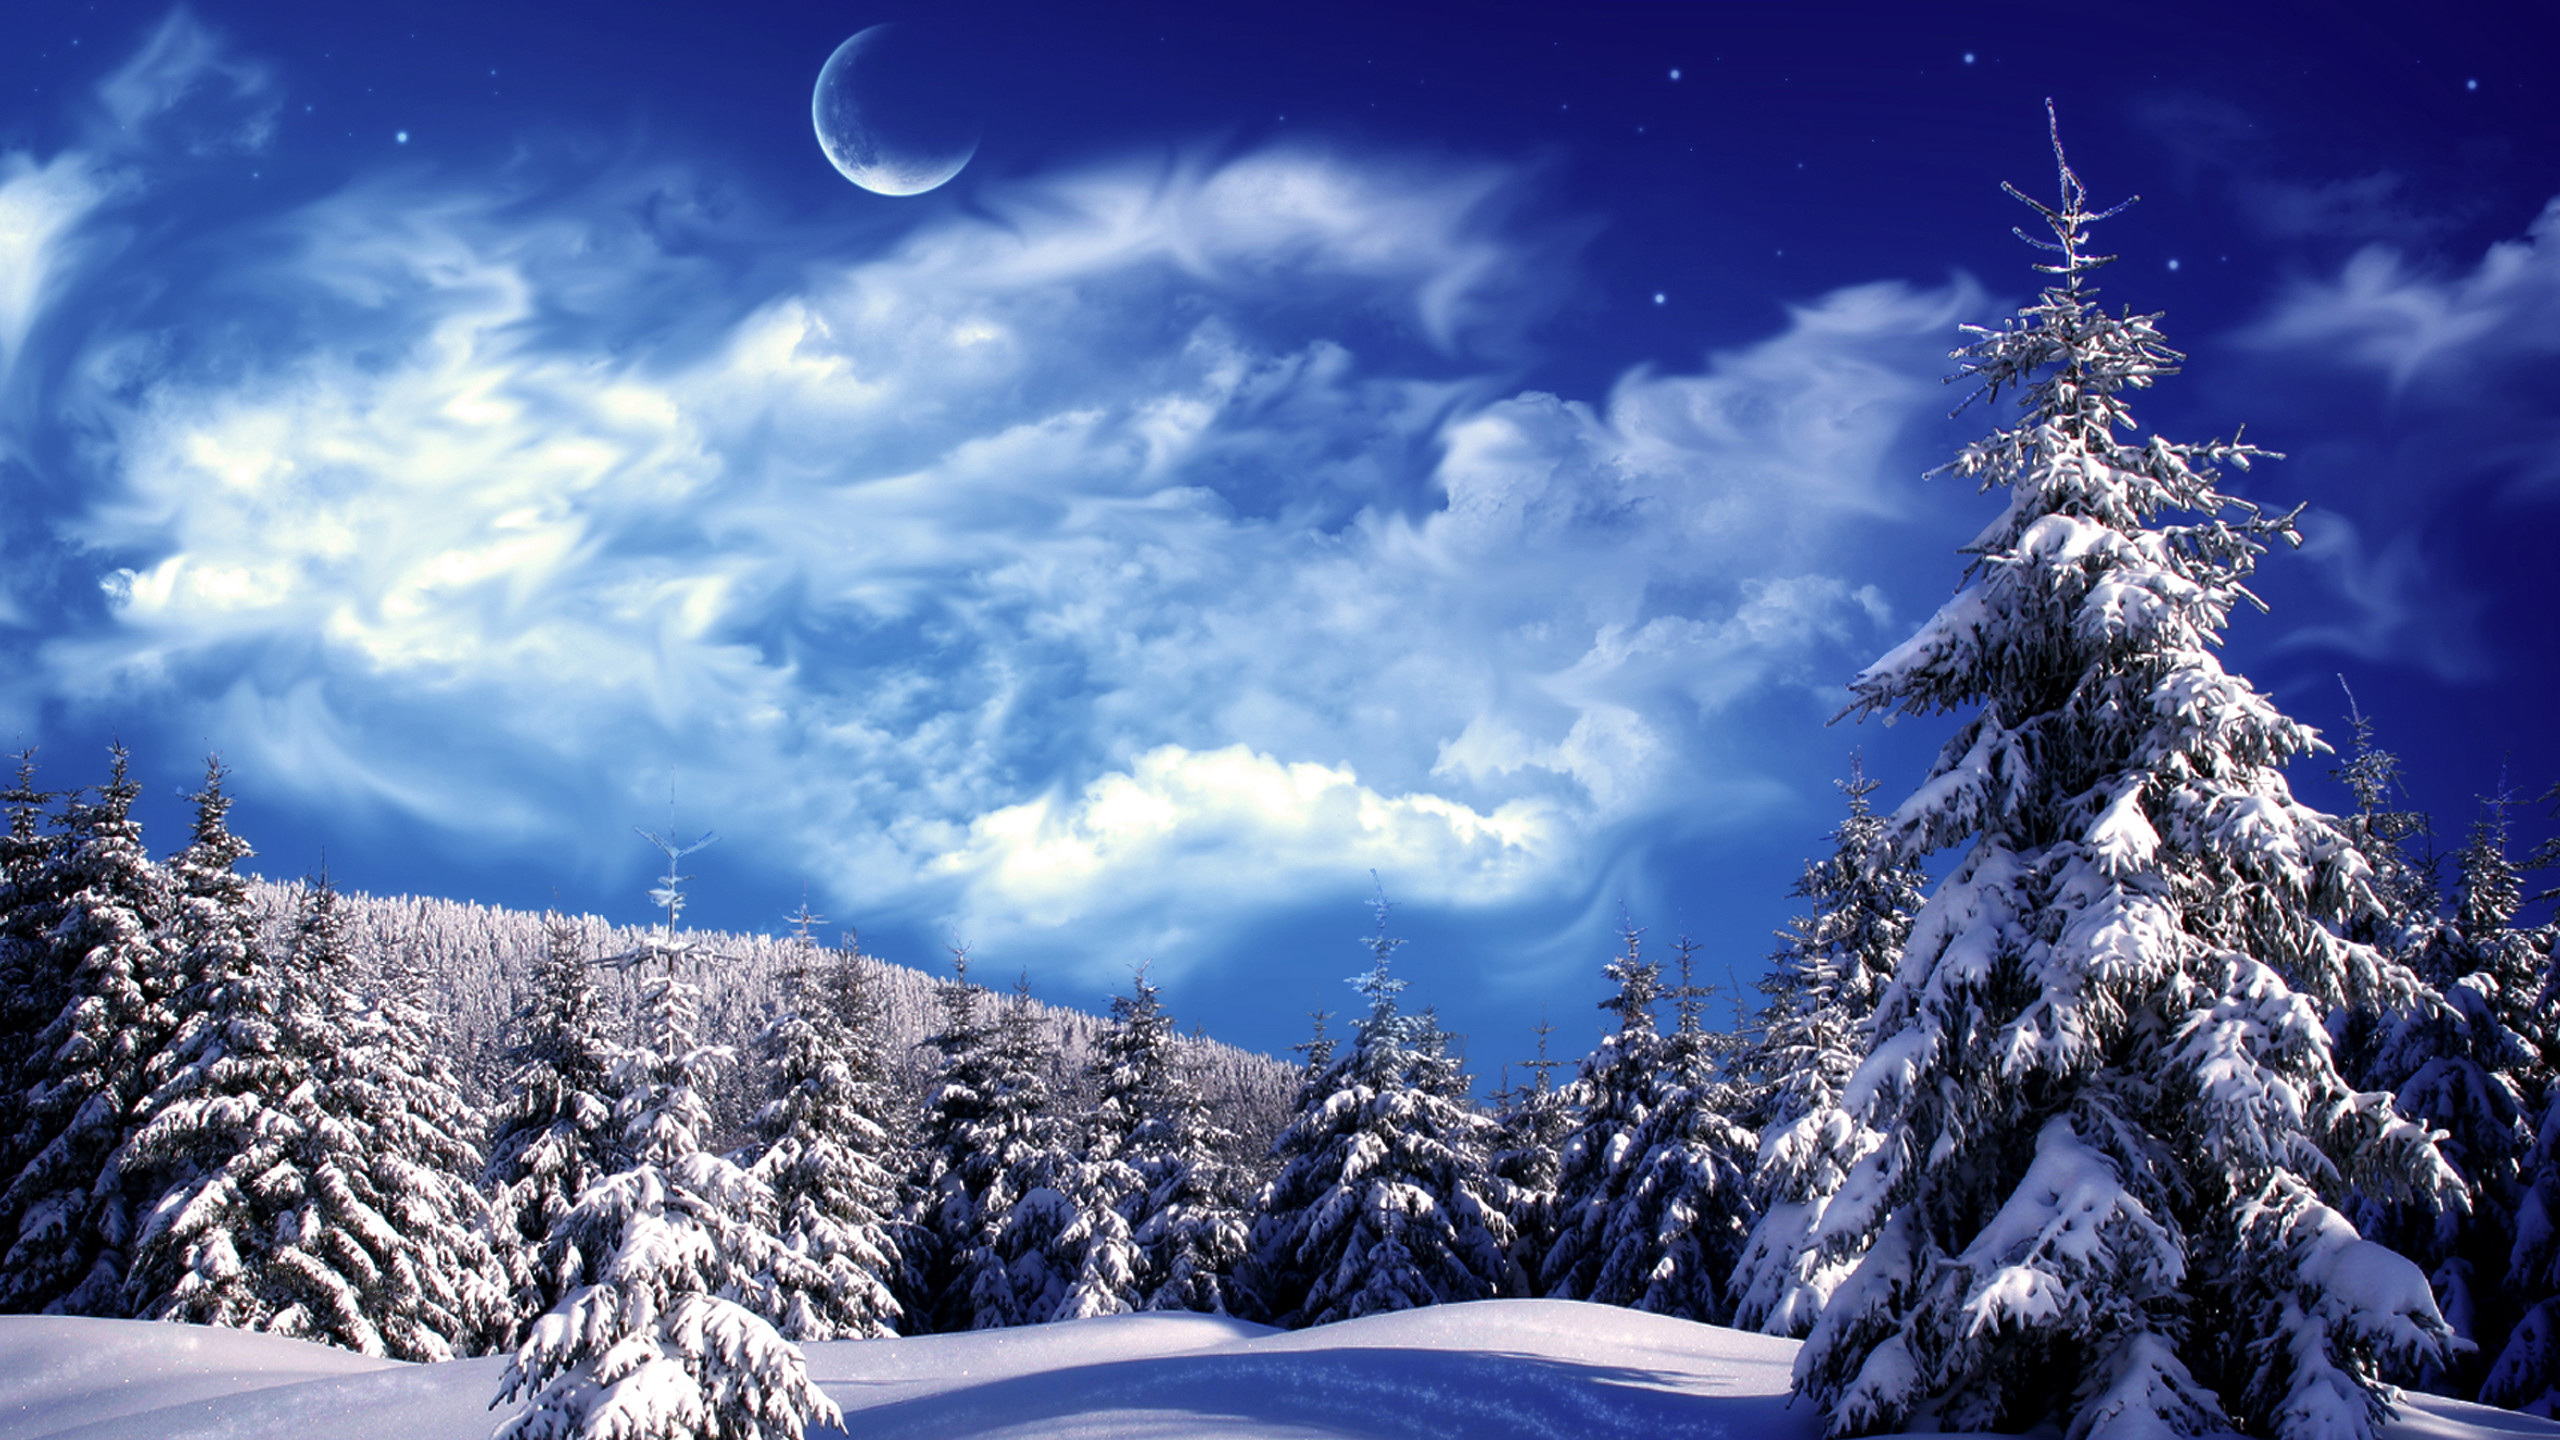 Winter And Snow Scenes   Wallpaper Bonzy